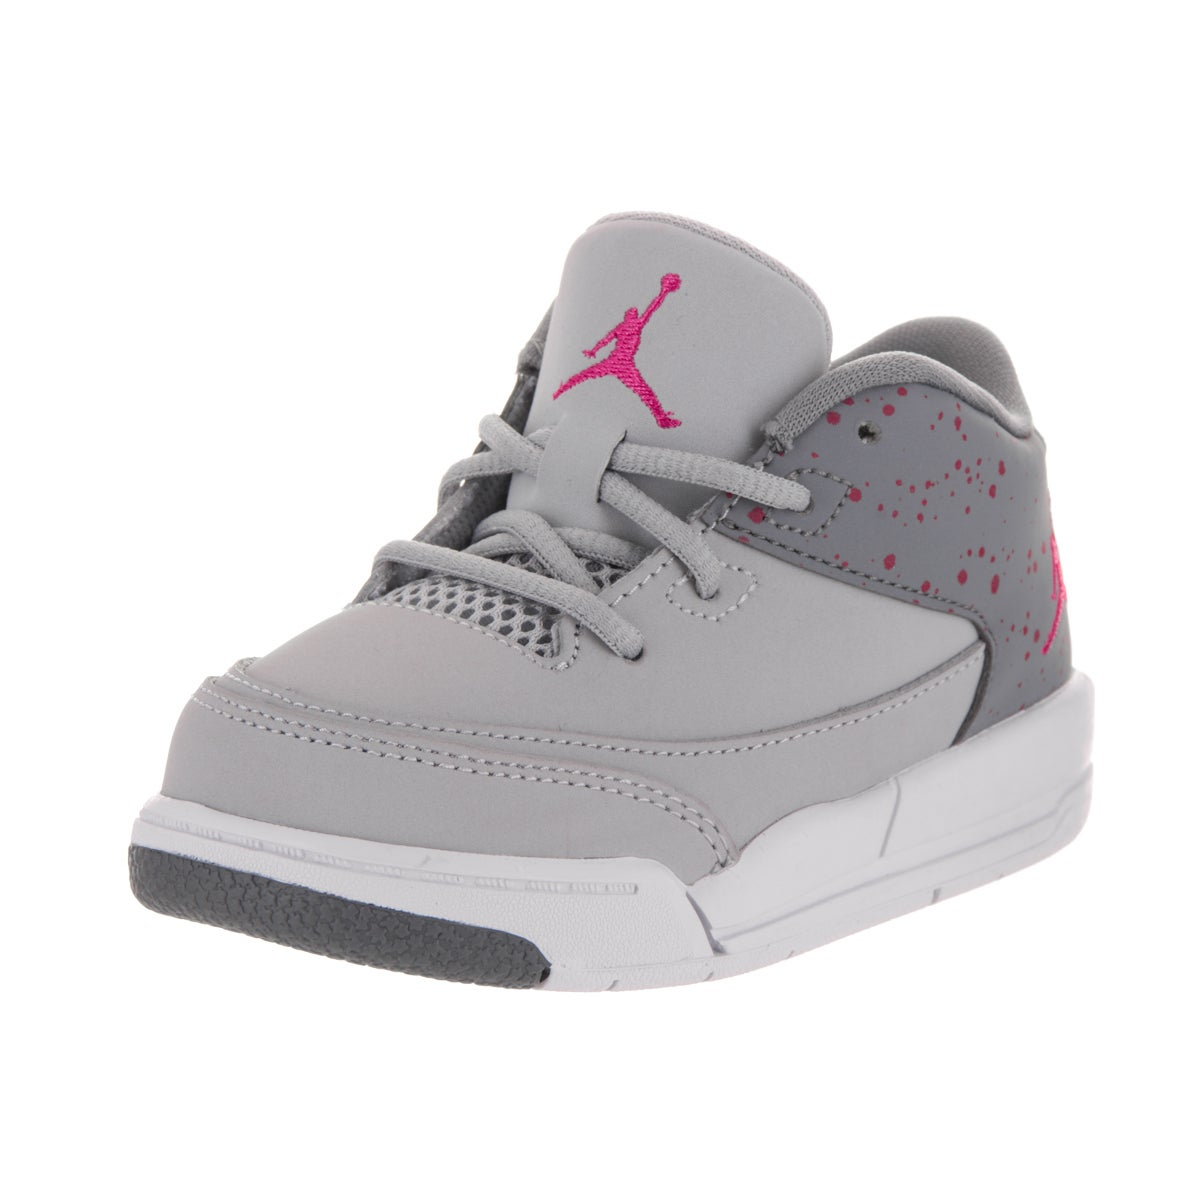 Nike Jordan Toddlers Jordan Flight Origin 3 Gt Grey Nubuc...